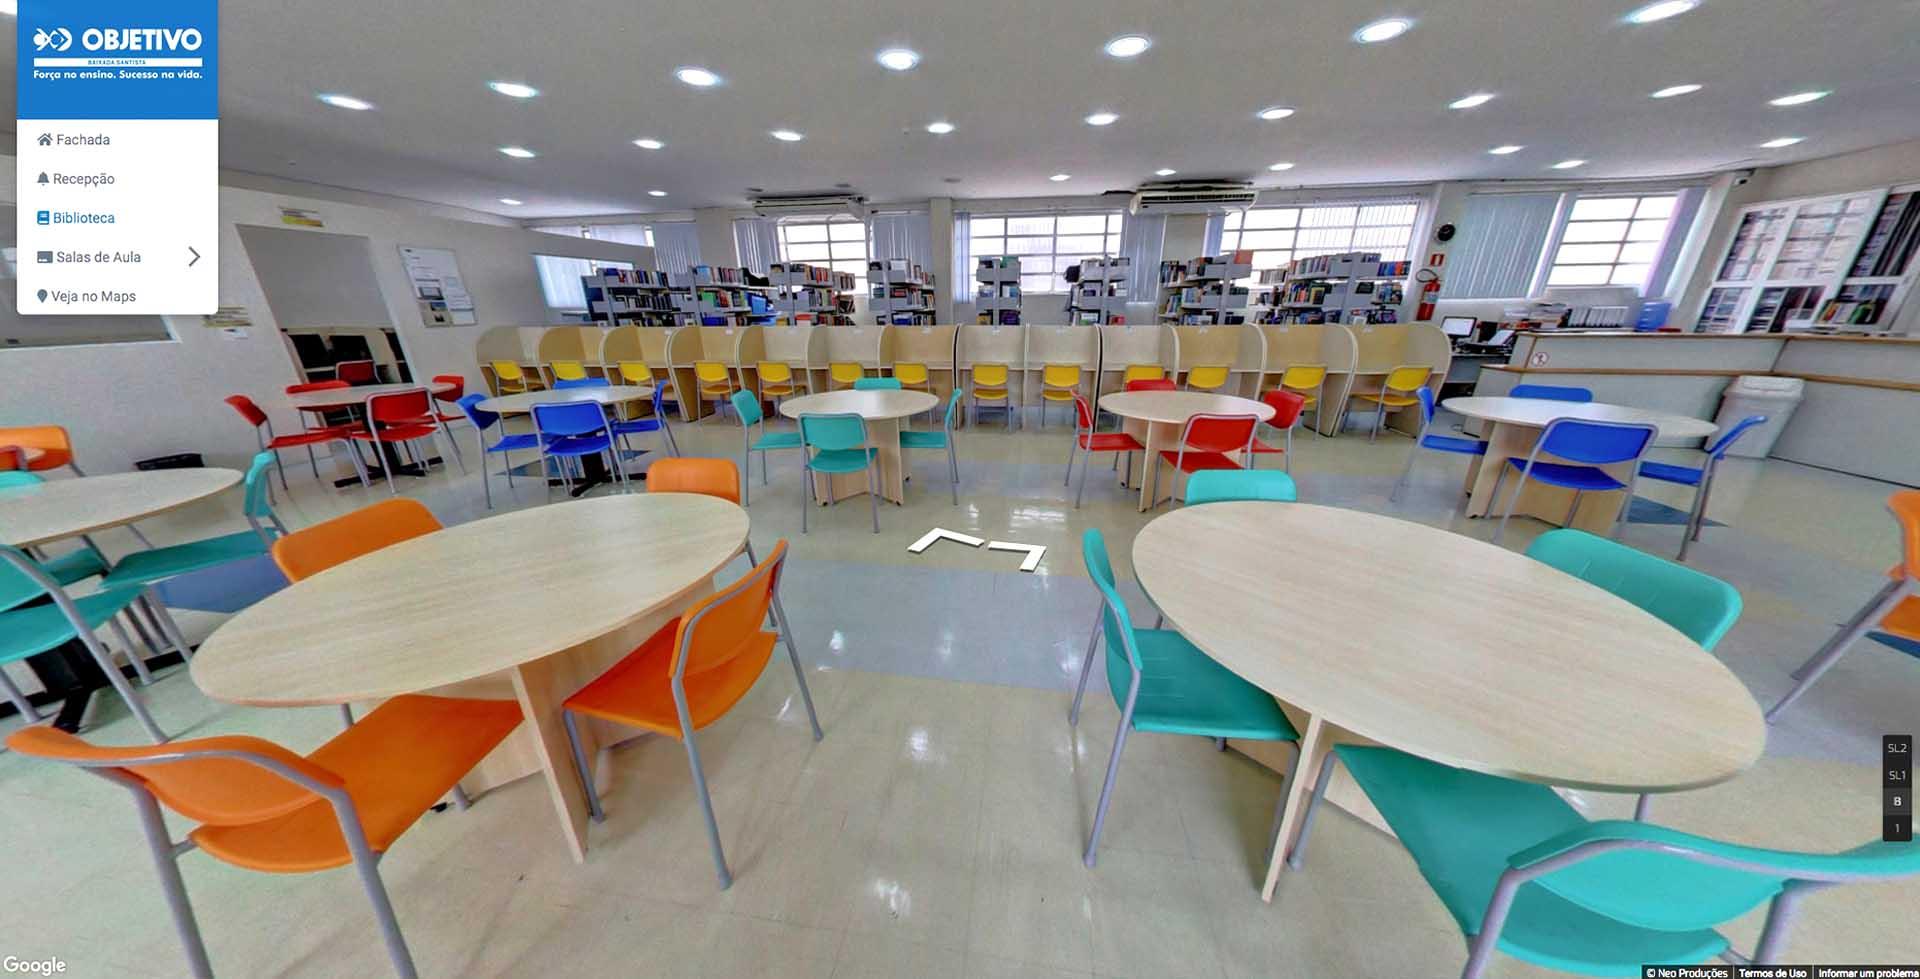 Colégio Objetivo | Santos